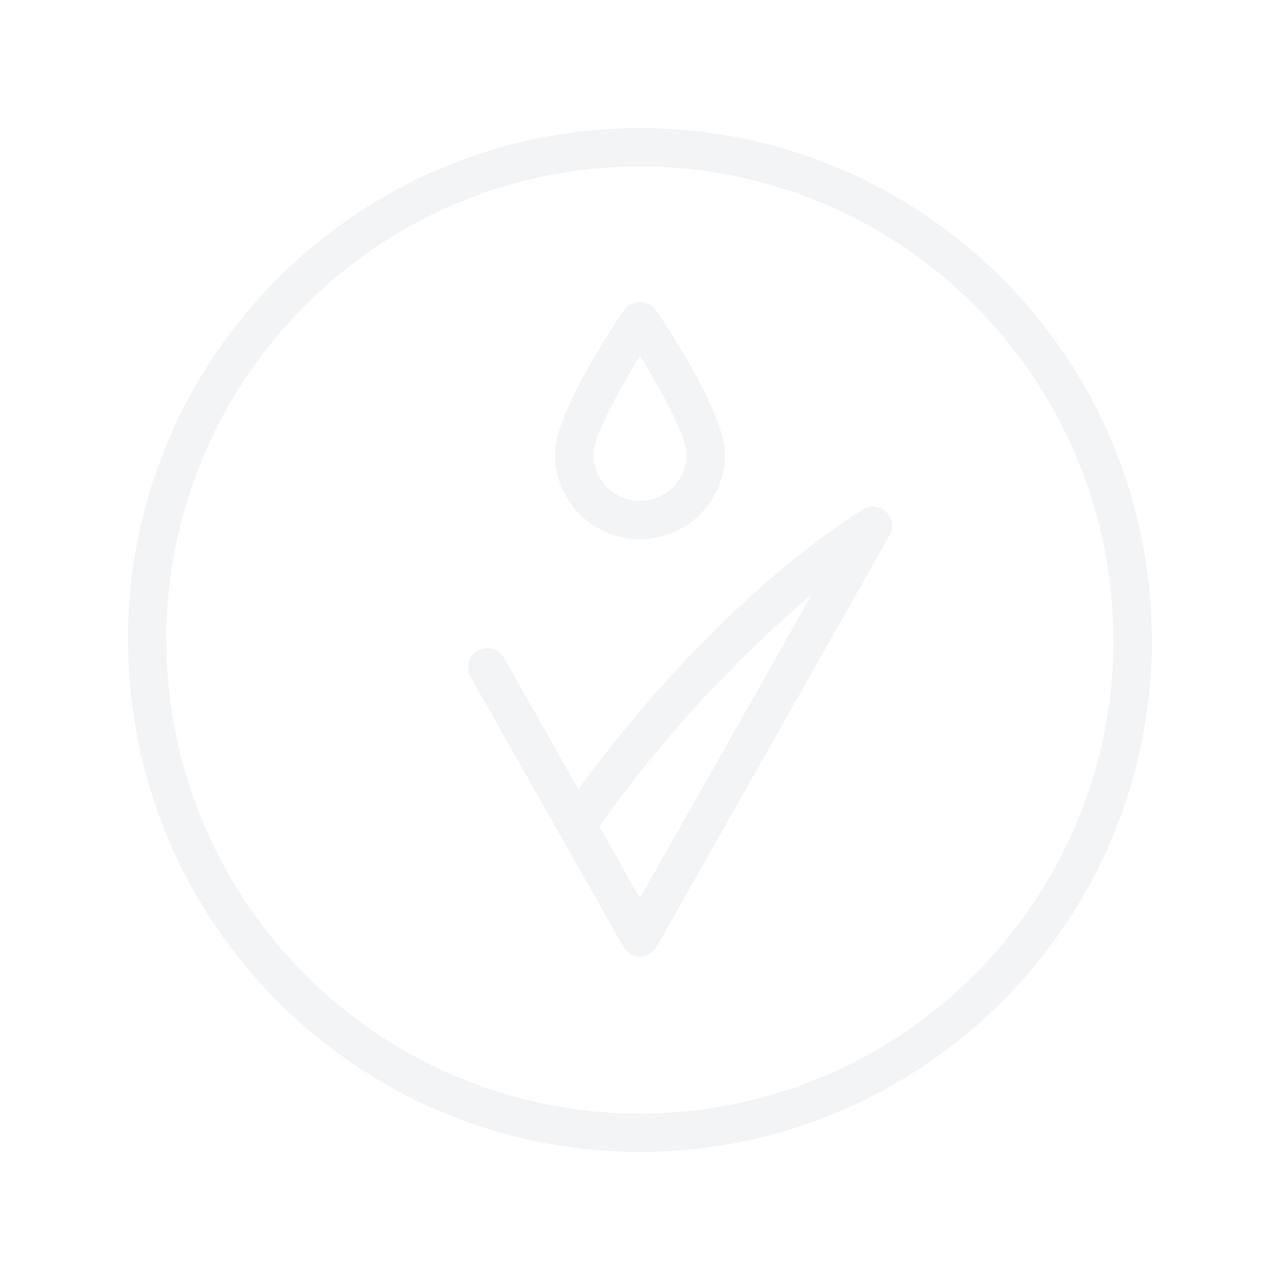 LUMENE Men Raikas 24h Roll-On Deodorant освежающий дезодорант 60ml